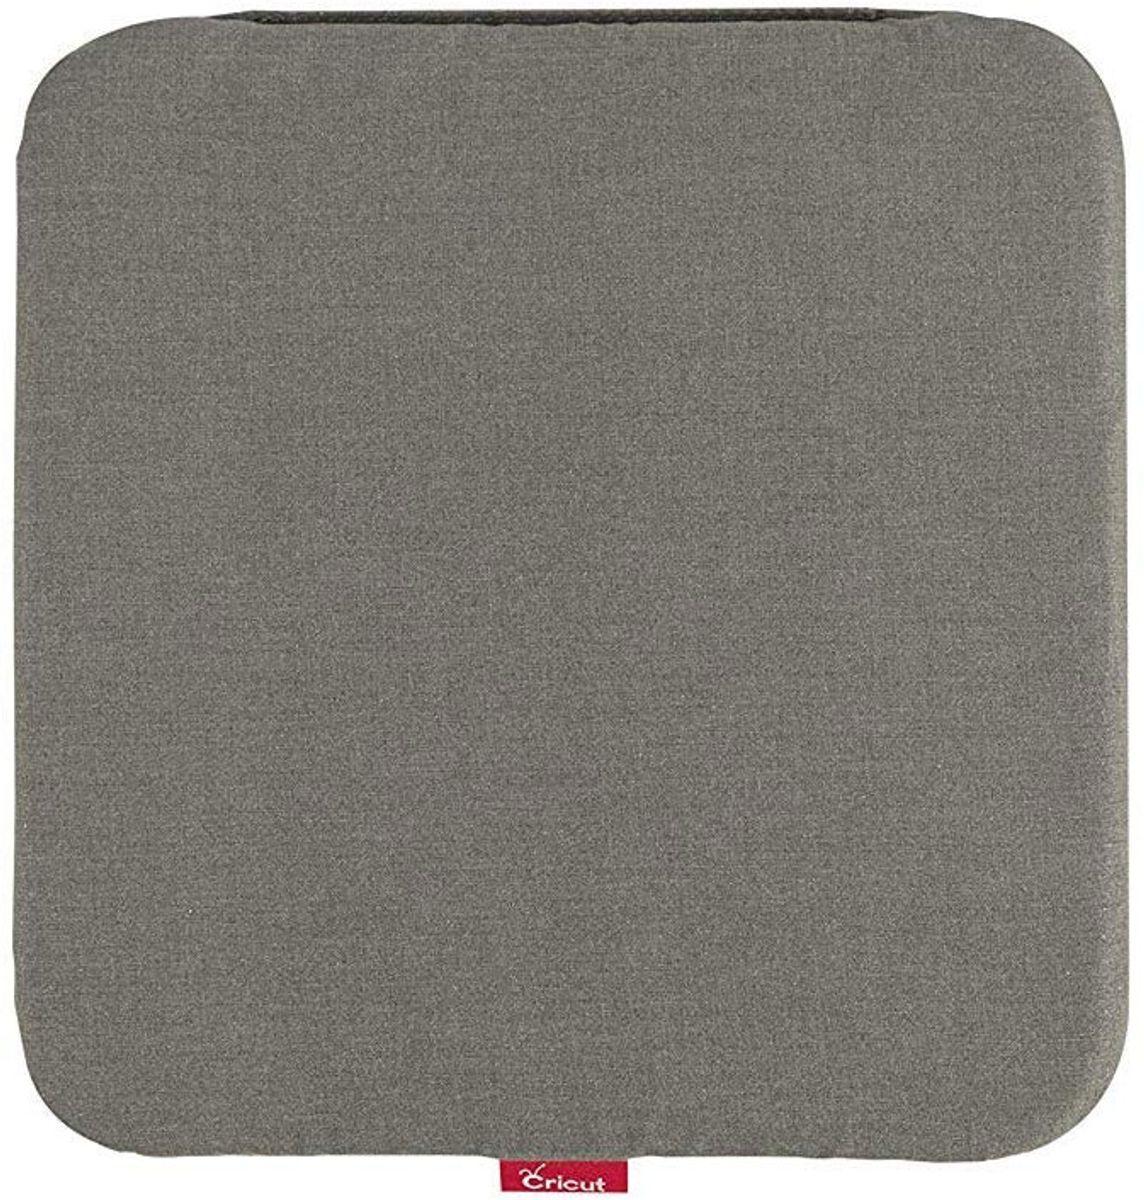 Tapis pour presse Cricut EasyPress 30,5 x 30,5 cm